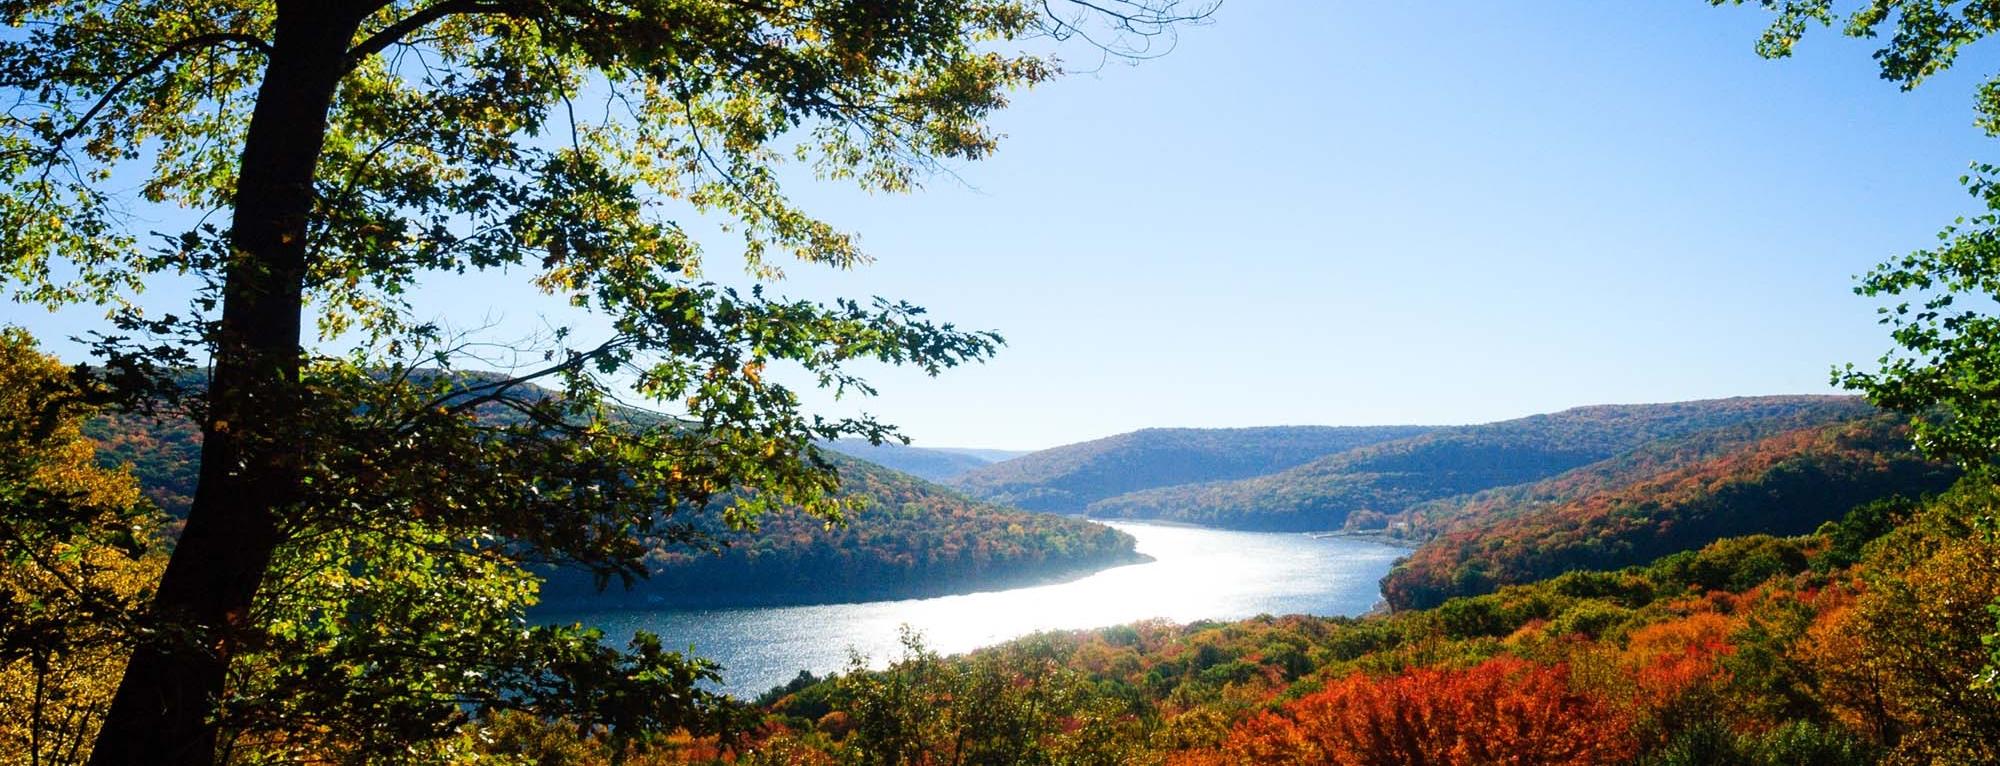 Pennsylvania-Poconos-River_16_9.jpg